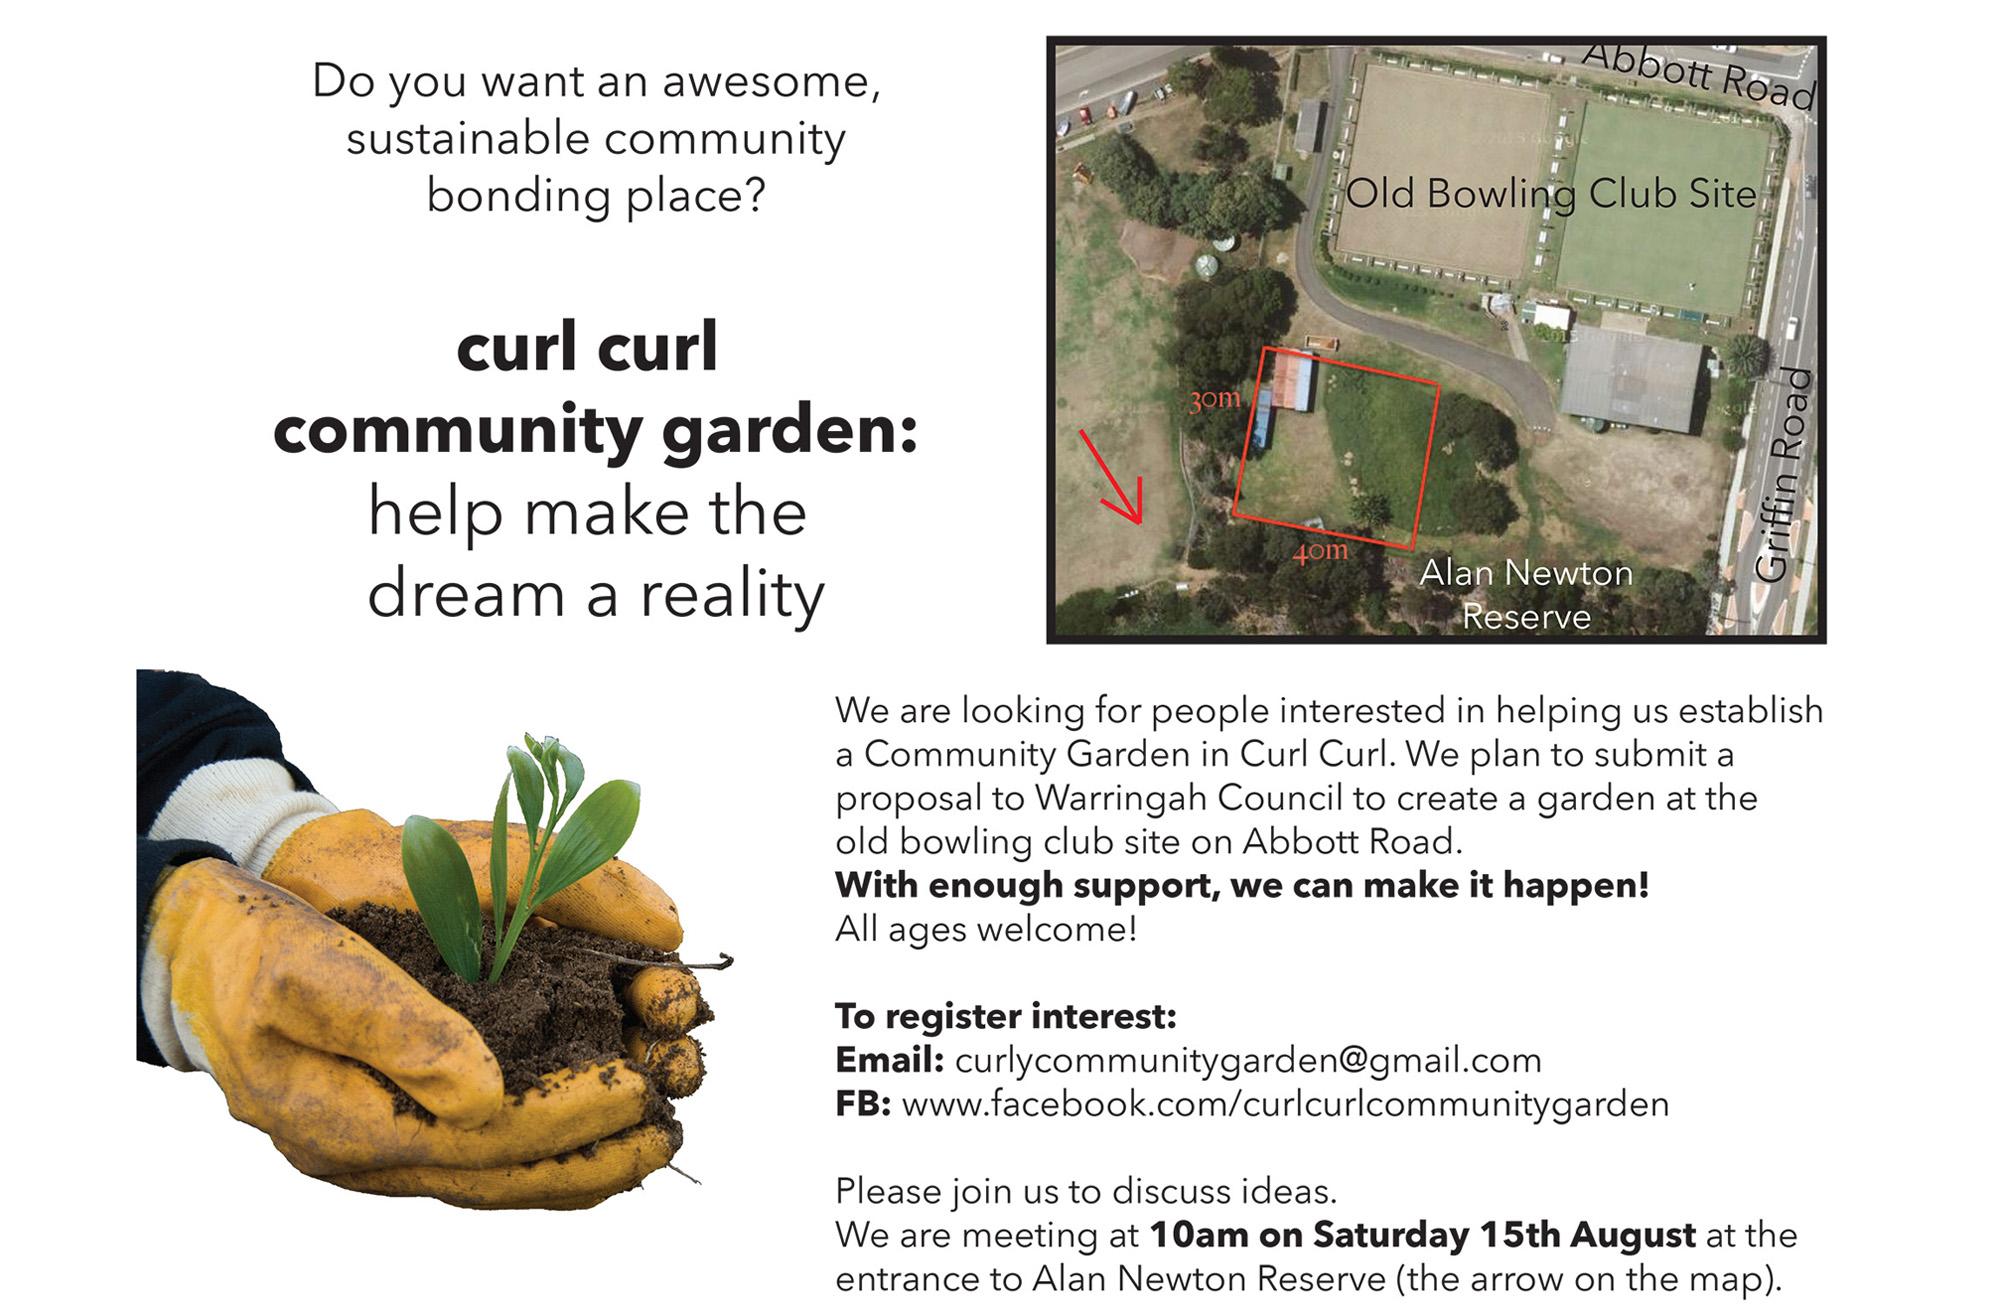 Curly Community Garden